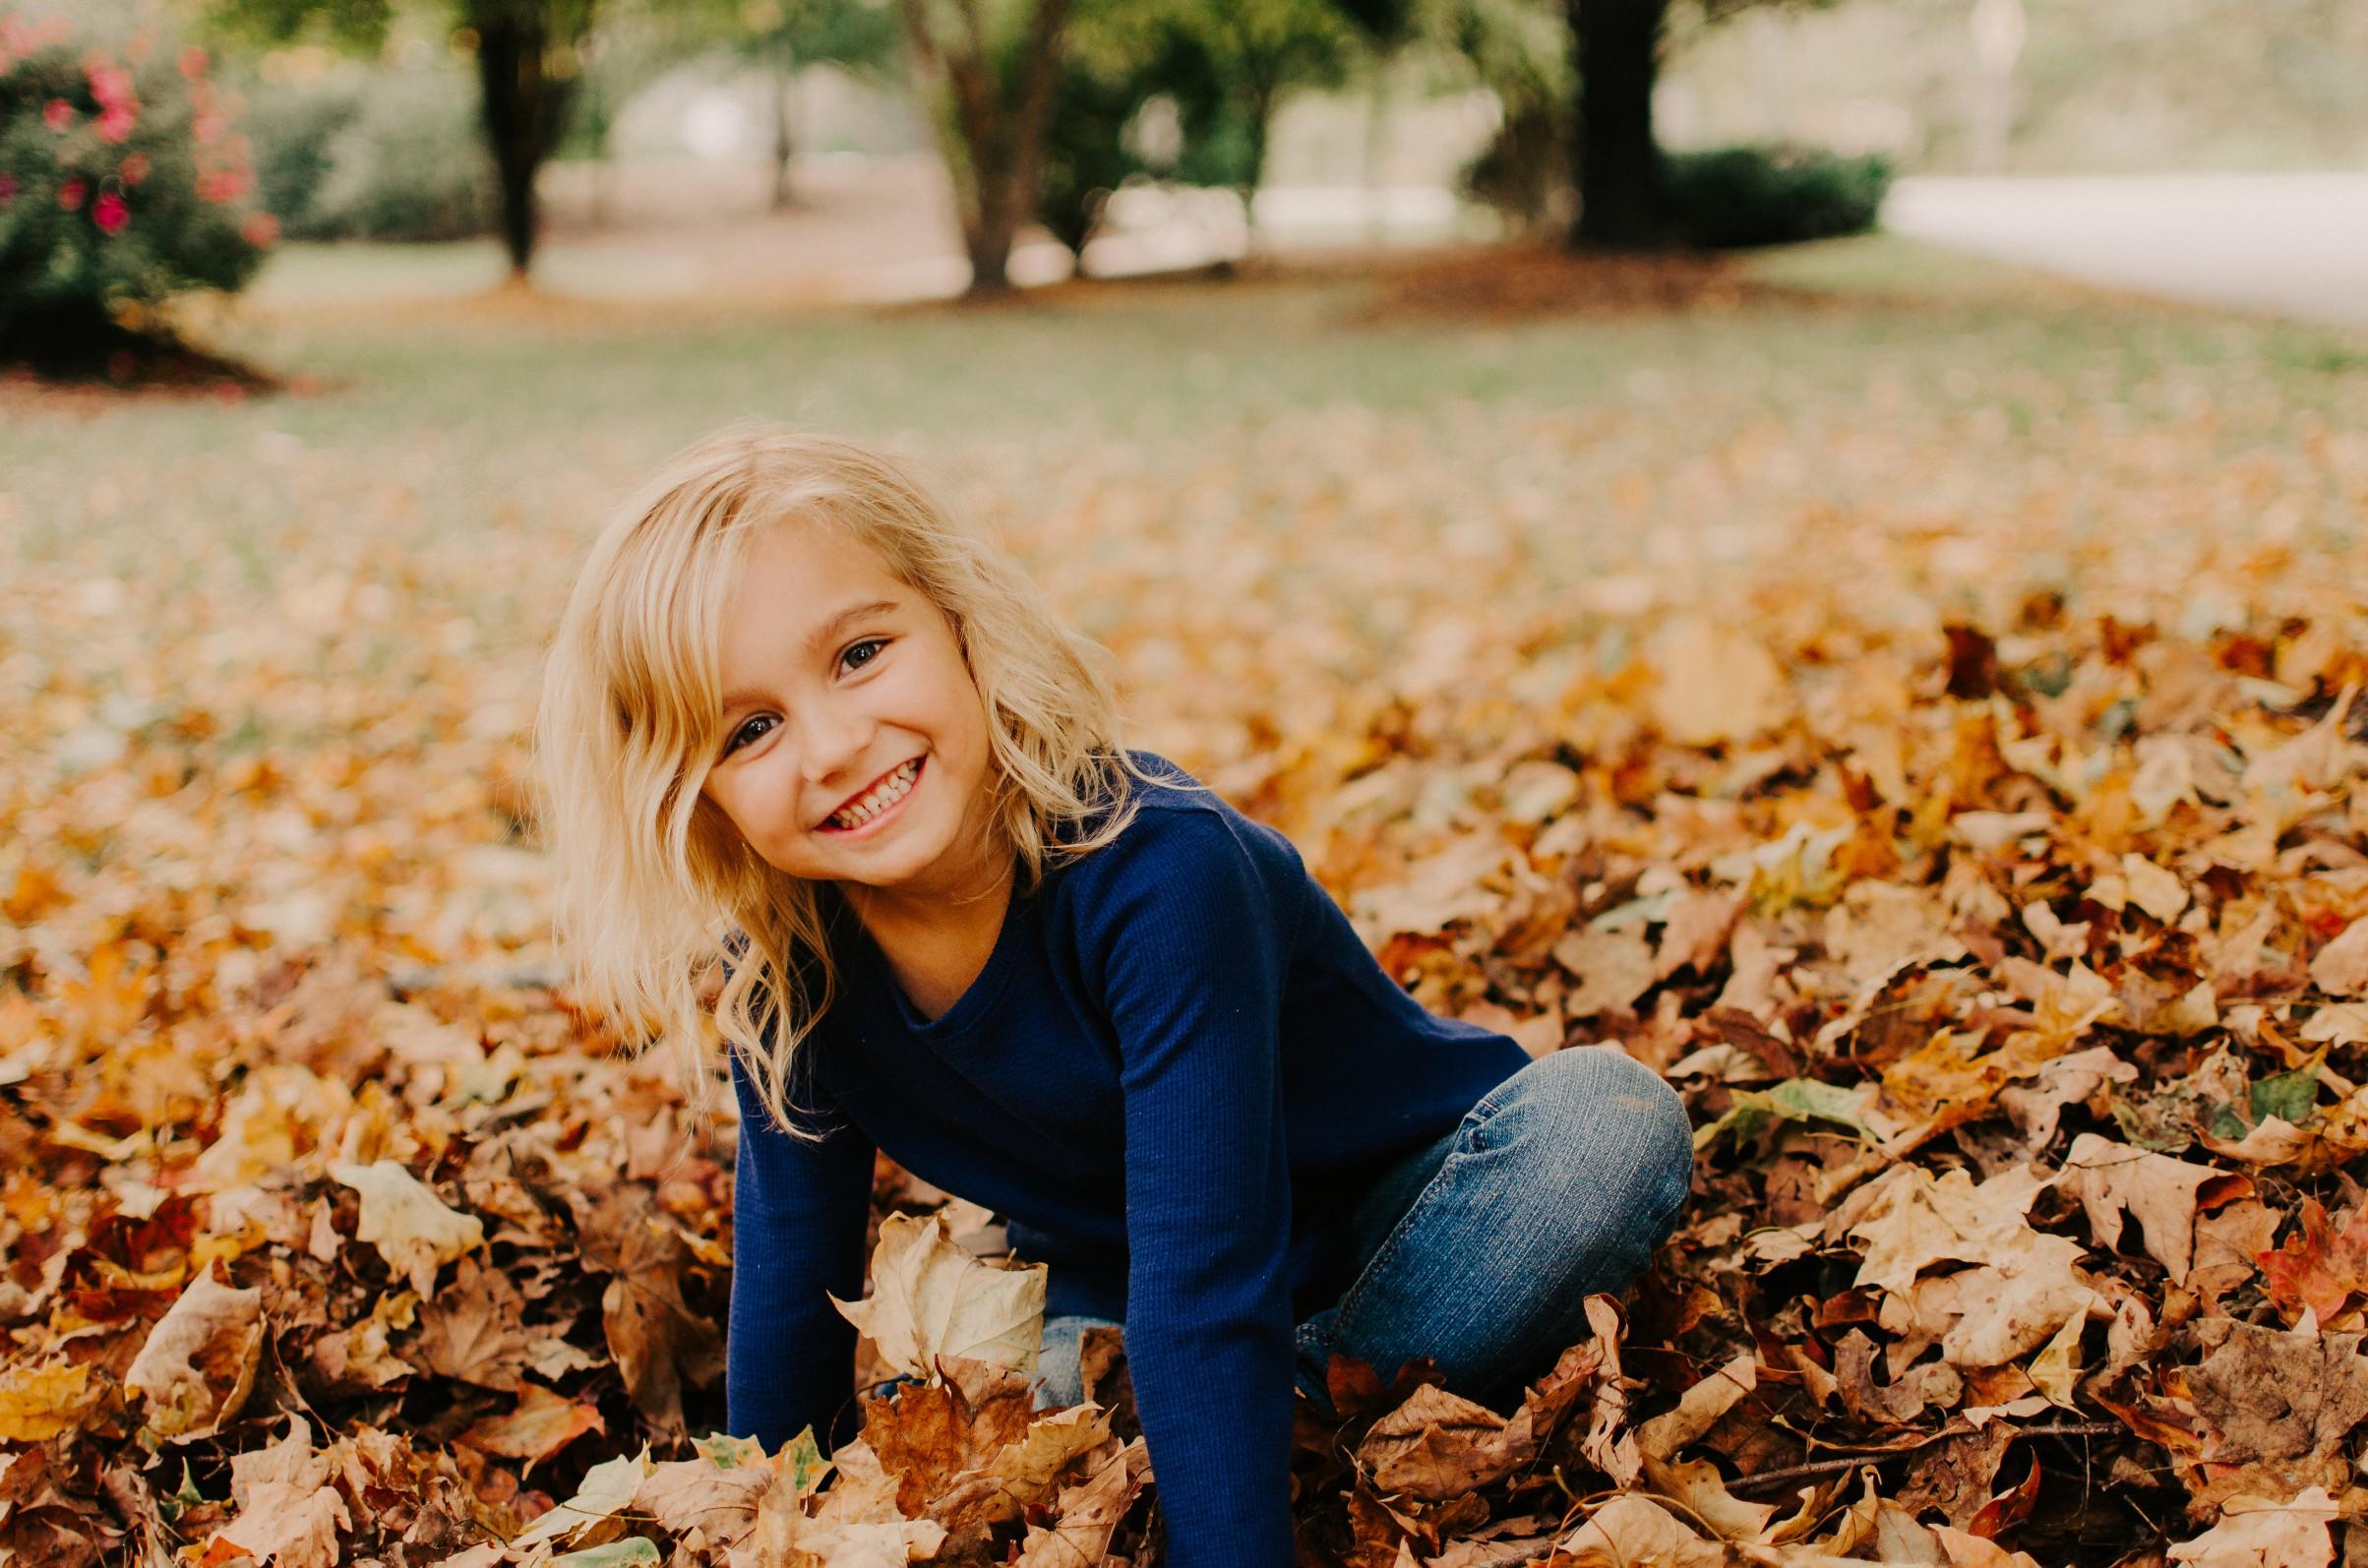 children-photography.jpg.